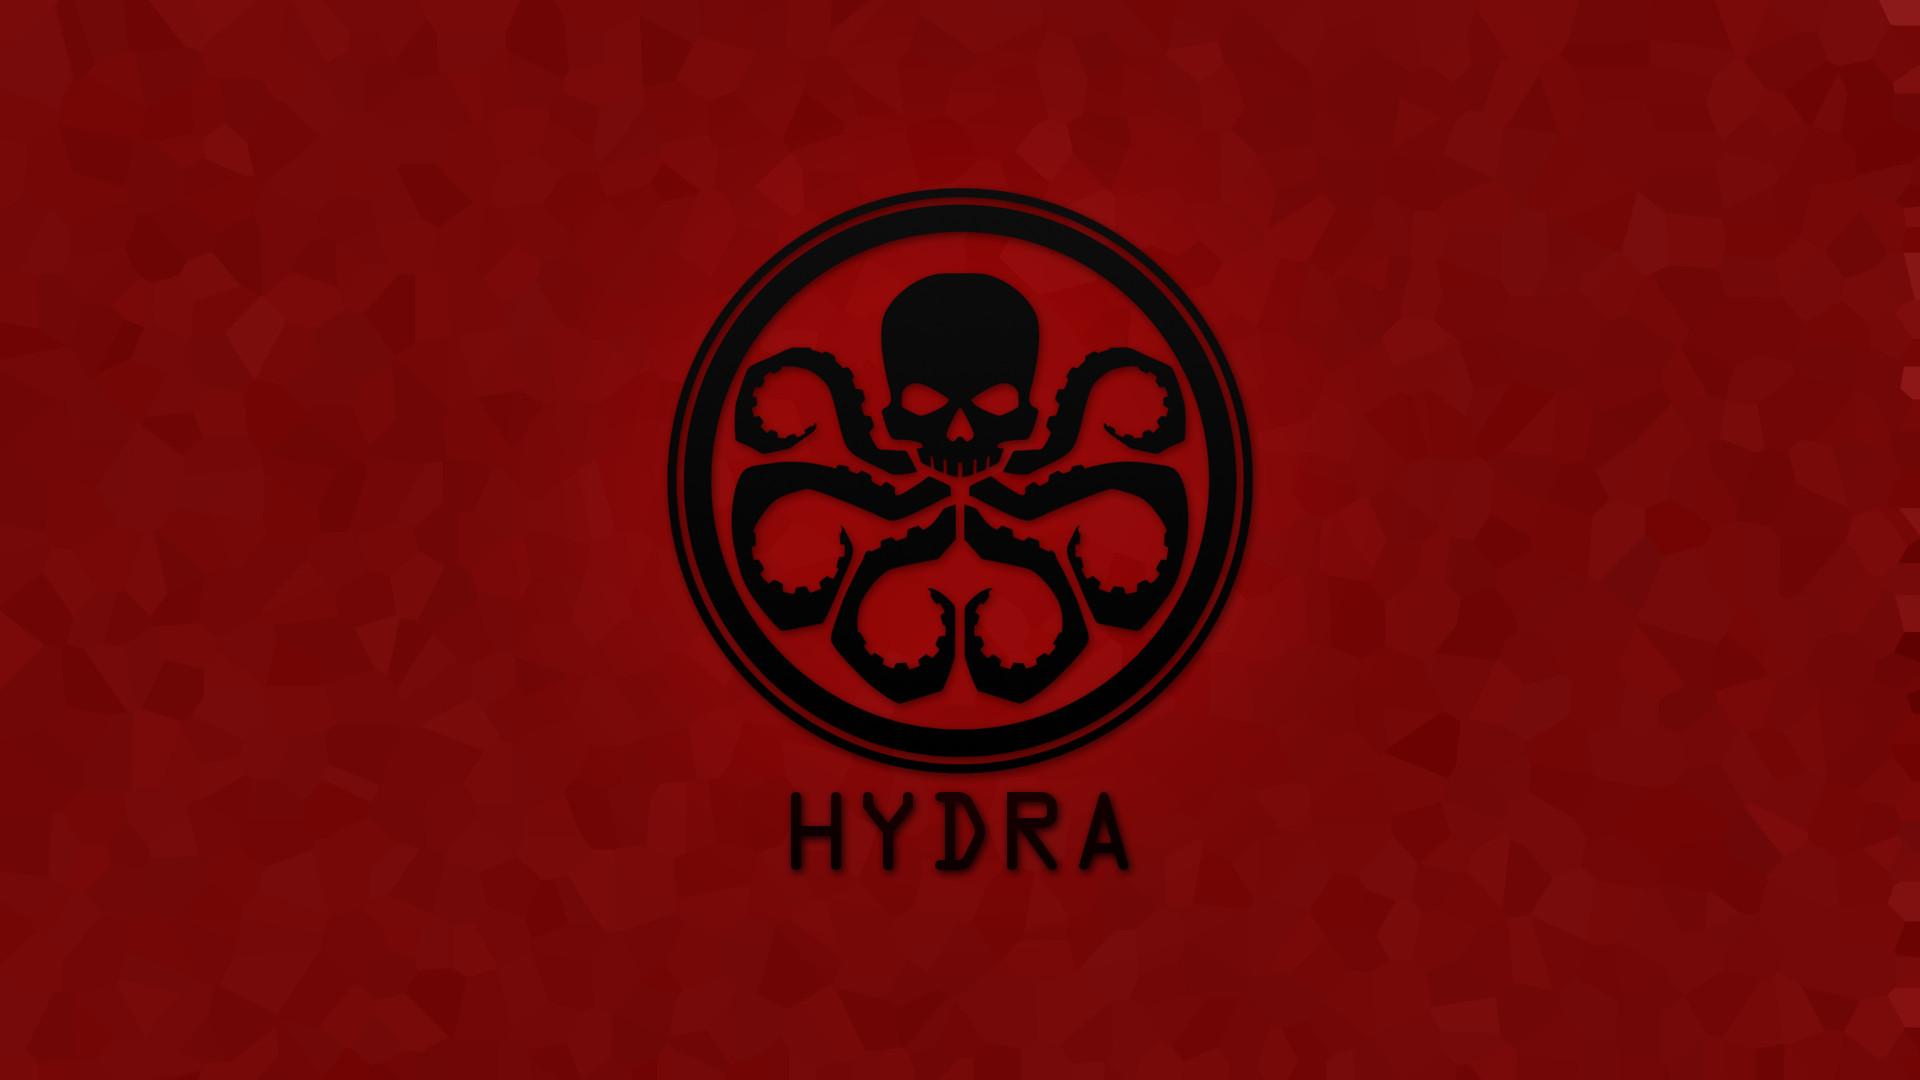 Wallpaper – Hydra by desous on DeviantArt